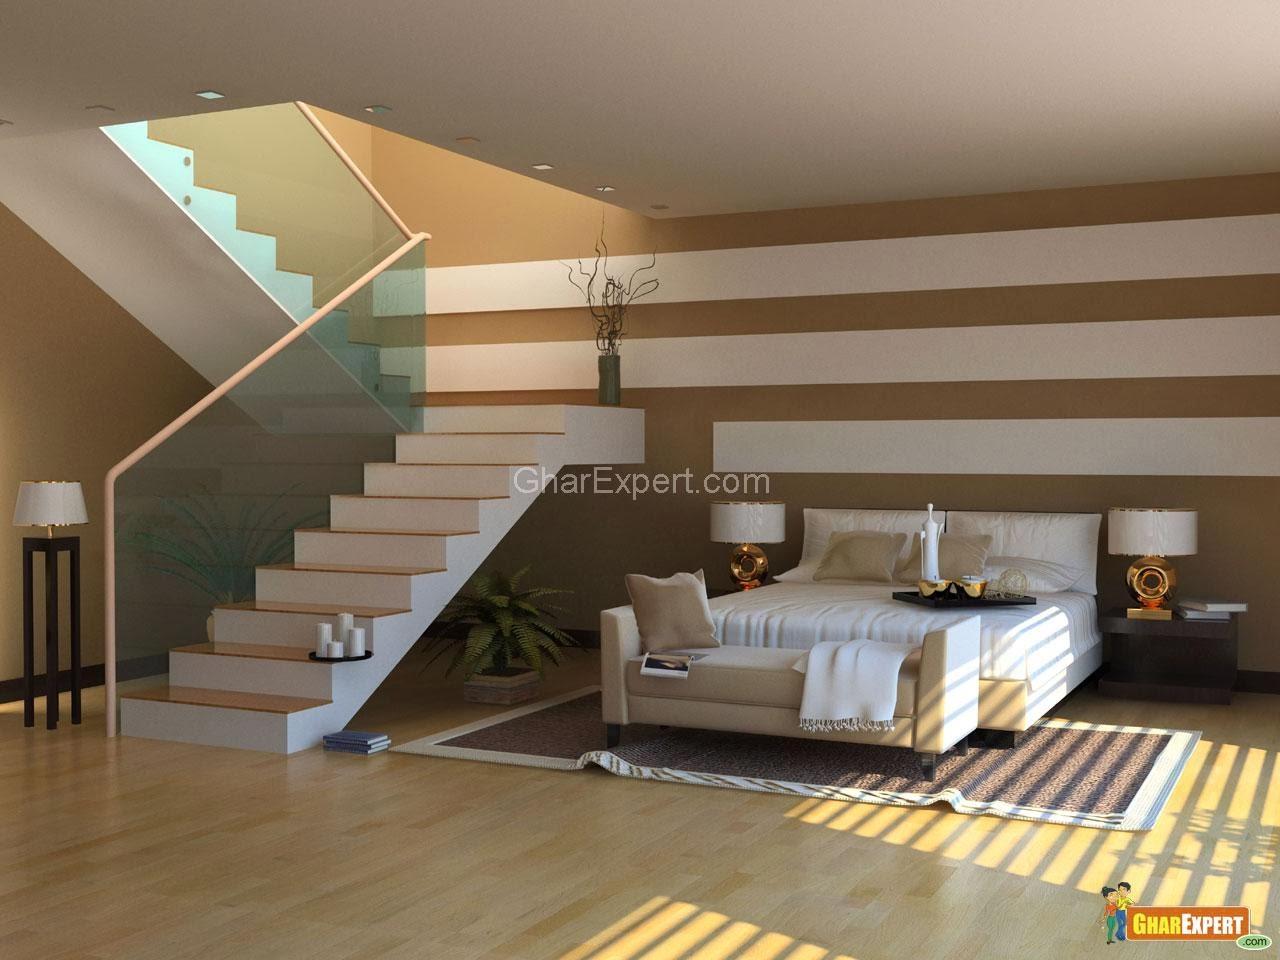 Foundation Dezin & Decor...: Master Bedroom Trends For 2014